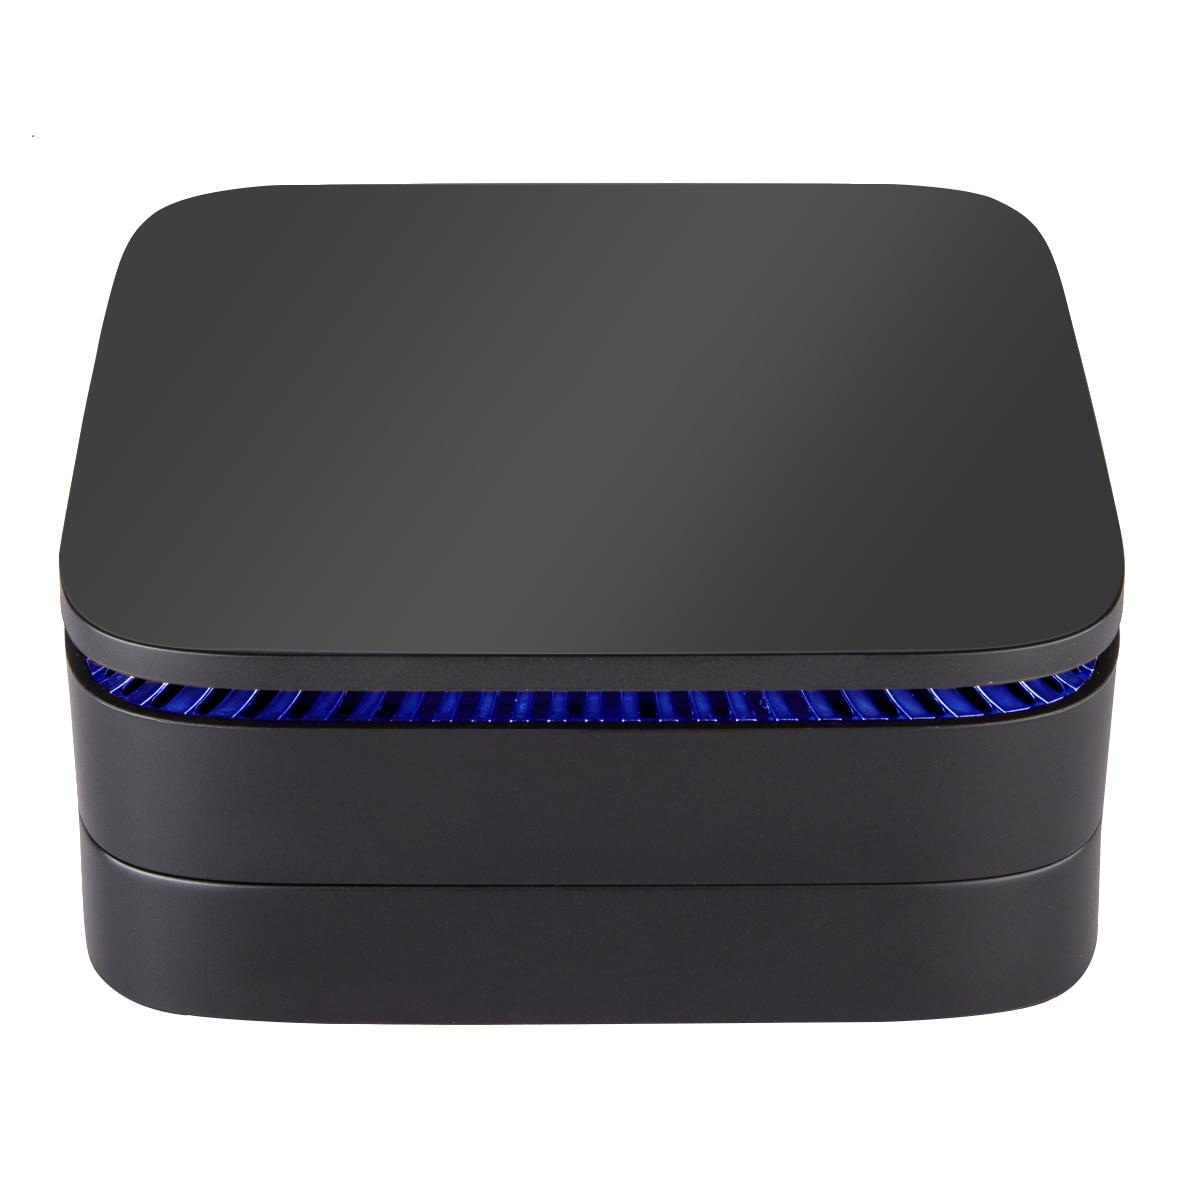 AK1 Mini PC Windows 10 Computer Intel Celeron J3455 Processor 4GB RAM 64GB SSD